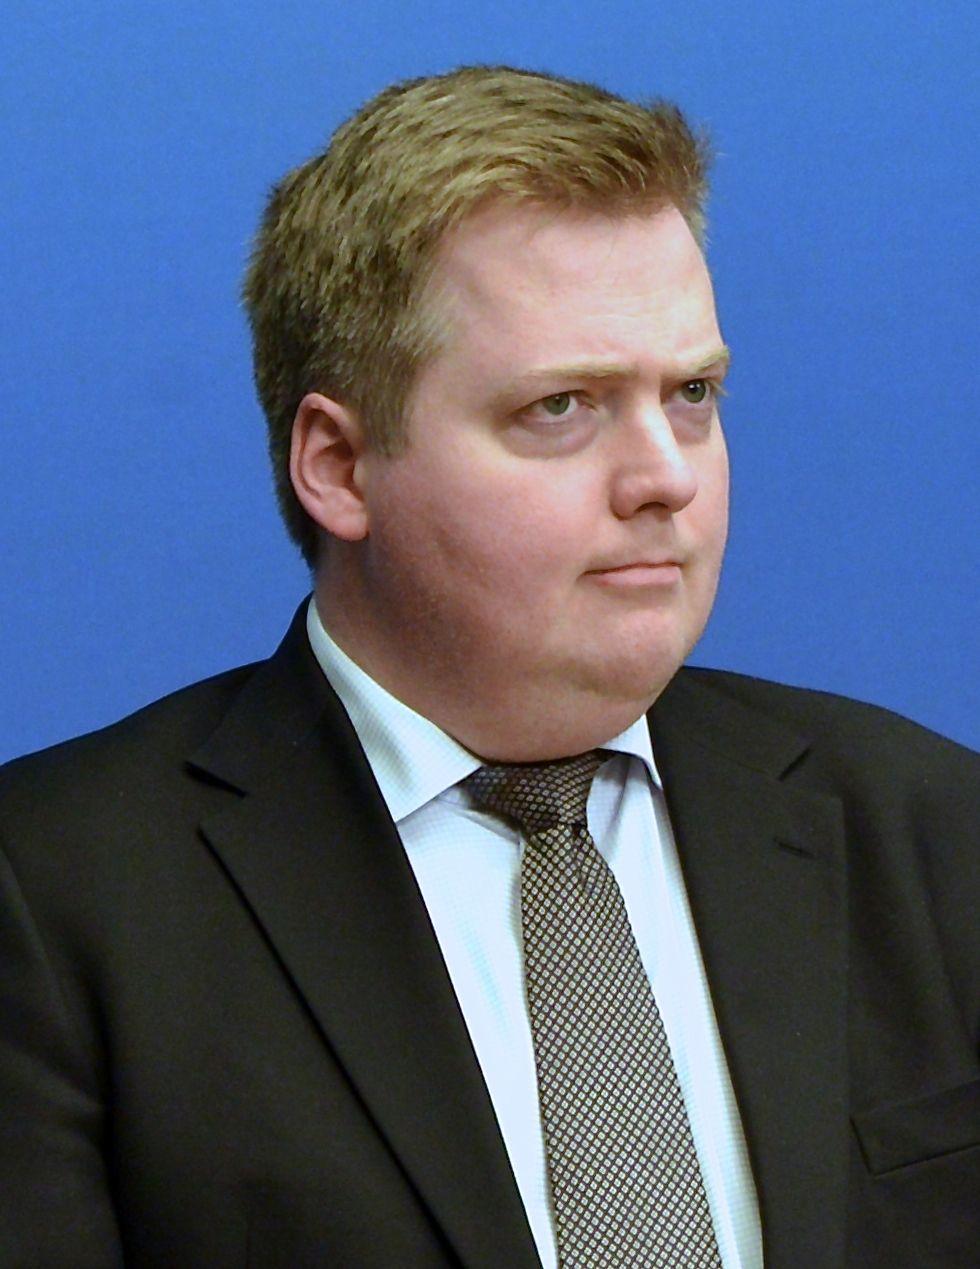 Gunnlaugsson